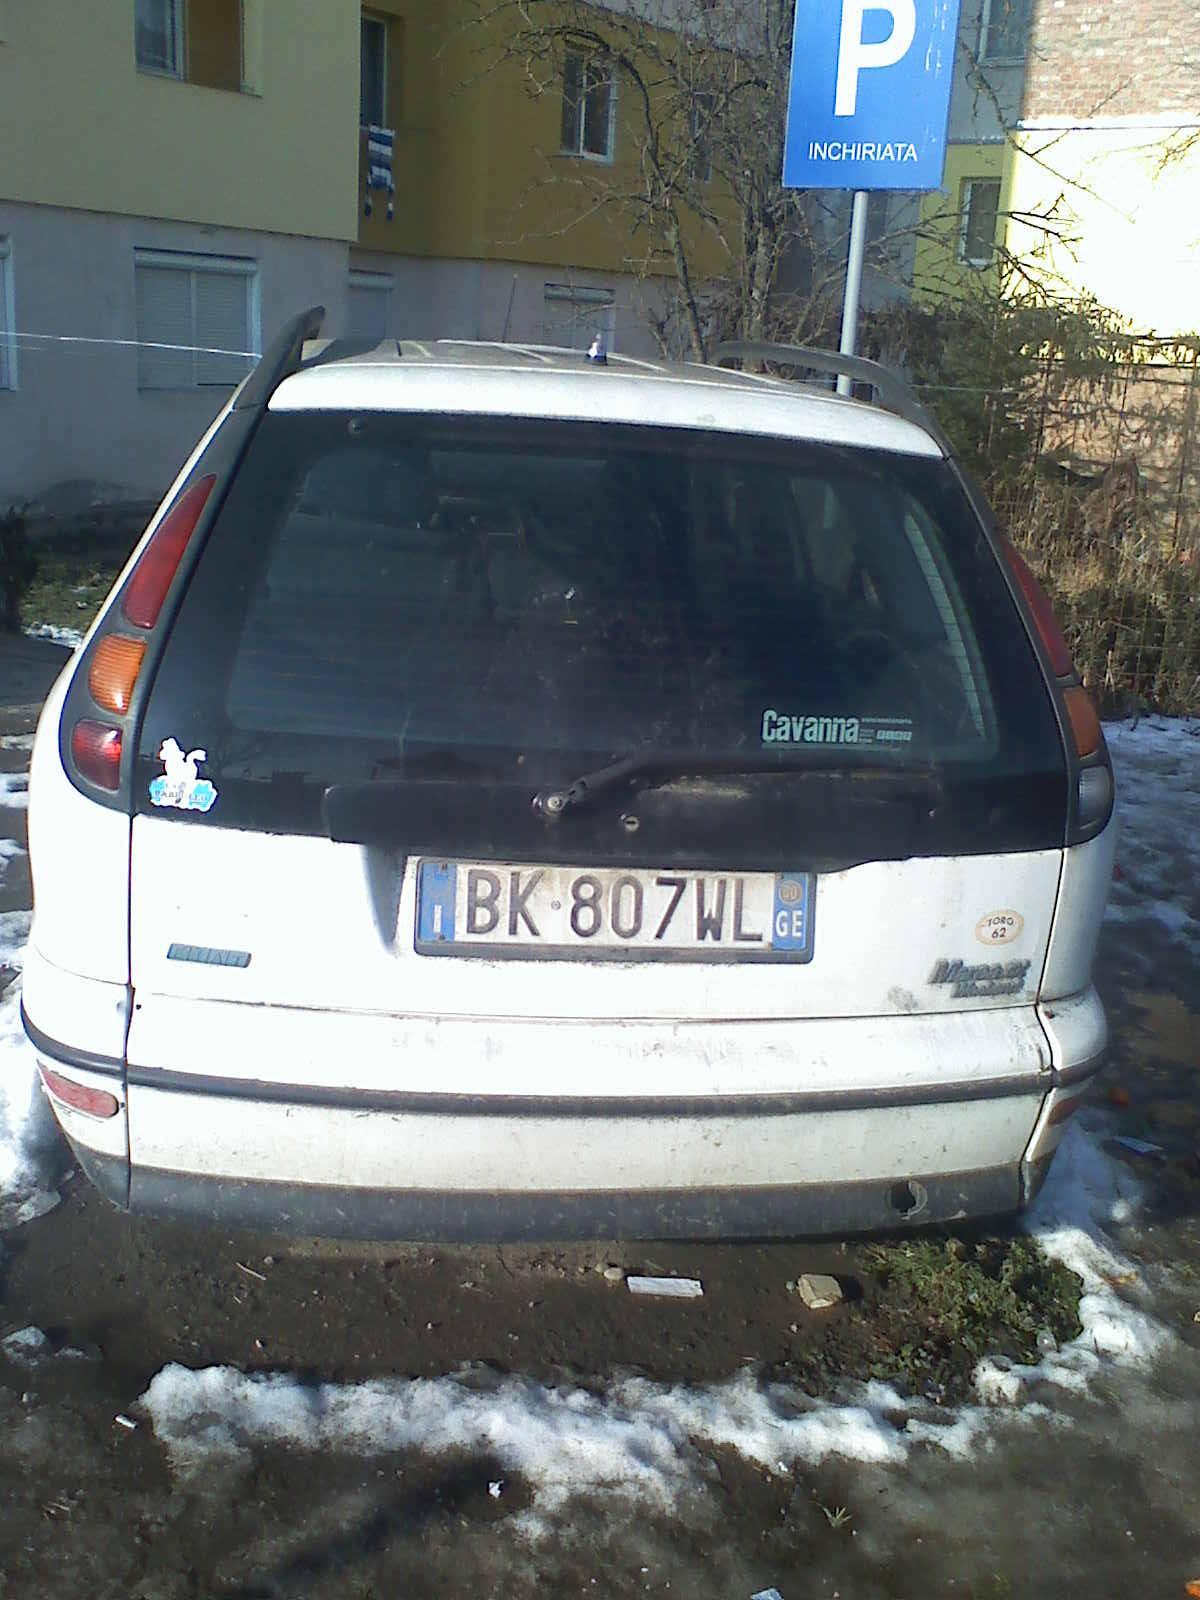 Fiat Marea avariat 2000 Benzina Combi - 04 Iulie 2011 - Poza 2